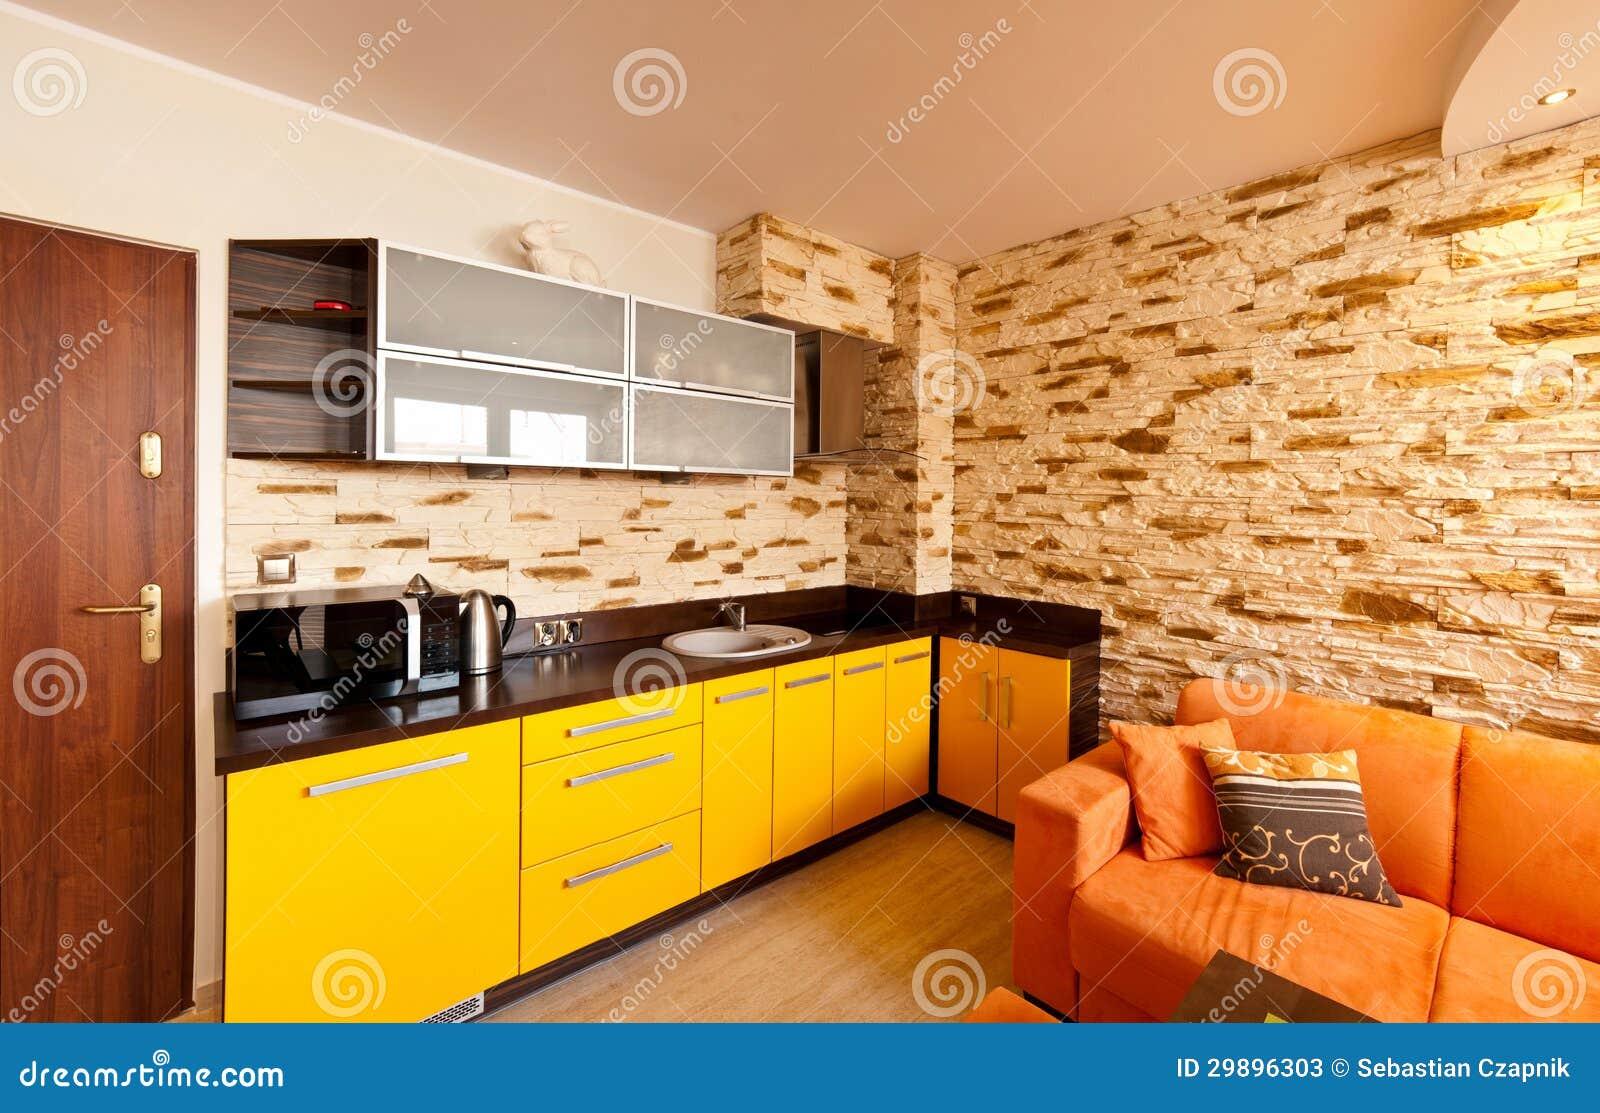 ... Piastrelle per parete cucina moderna. Piastrelle parete cucina moderna